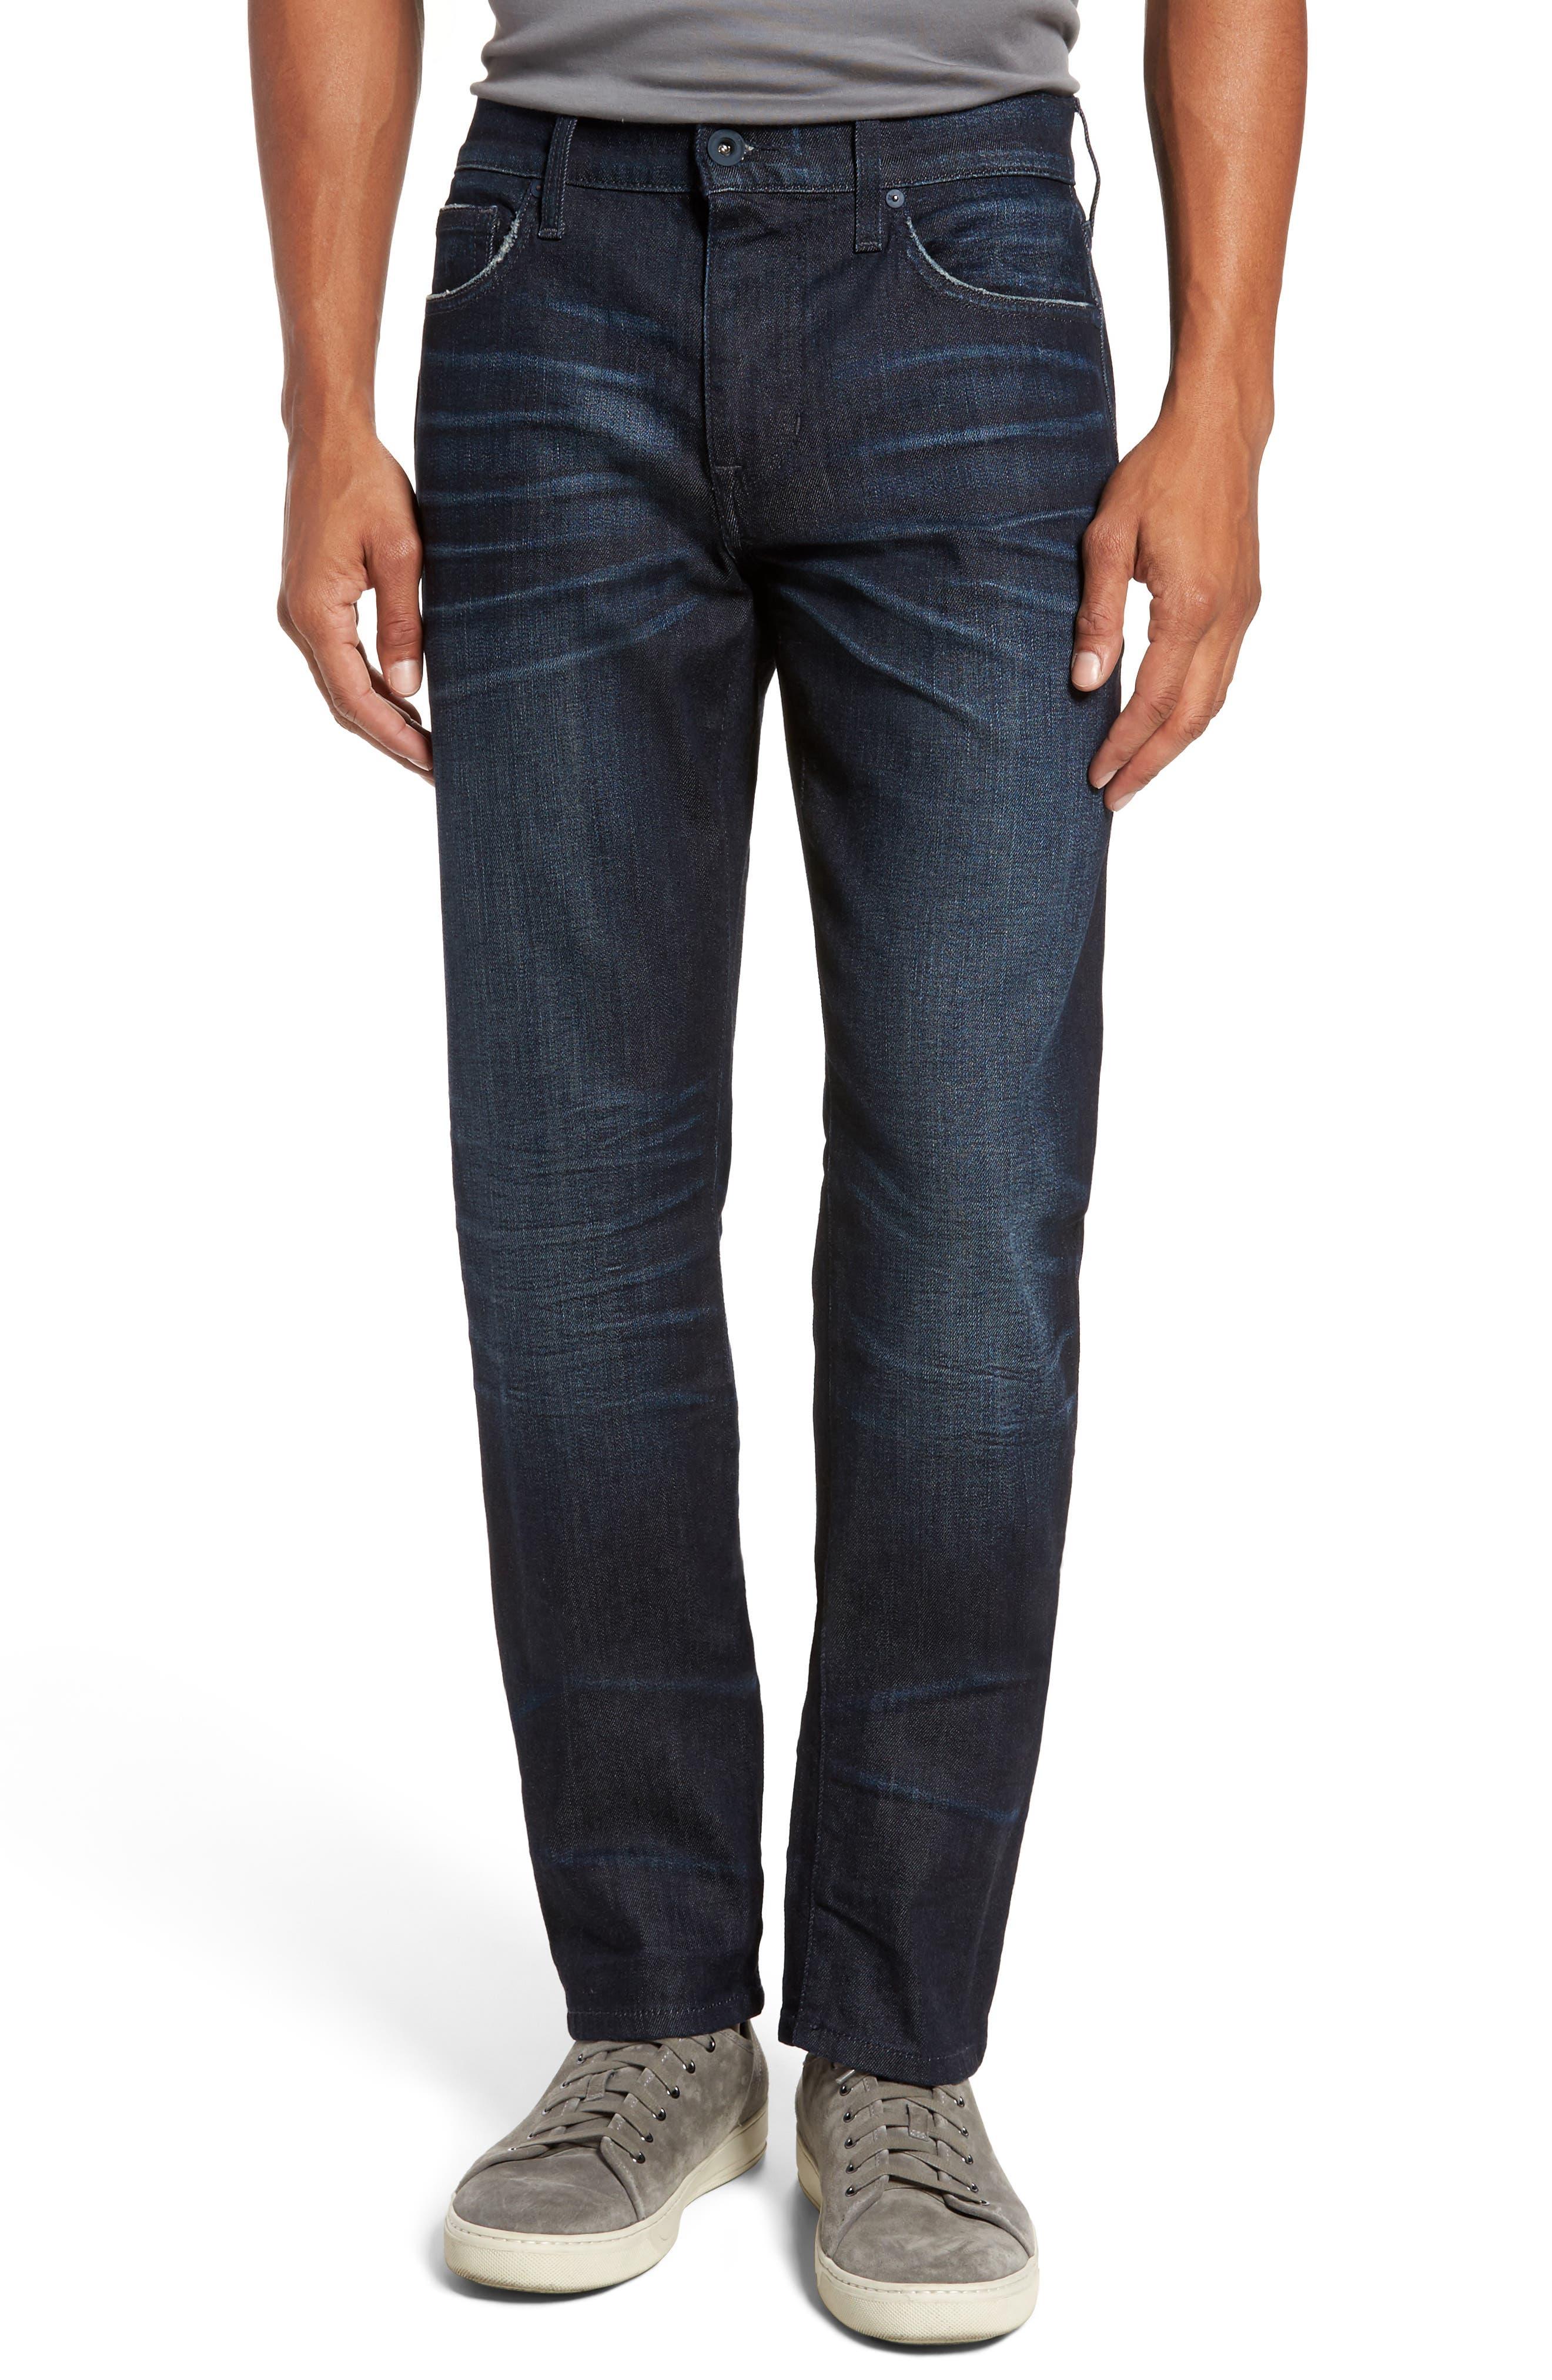 Brixton Slim Straight Fit Jeans,                             Main thumbnail 1, color,                             Maag